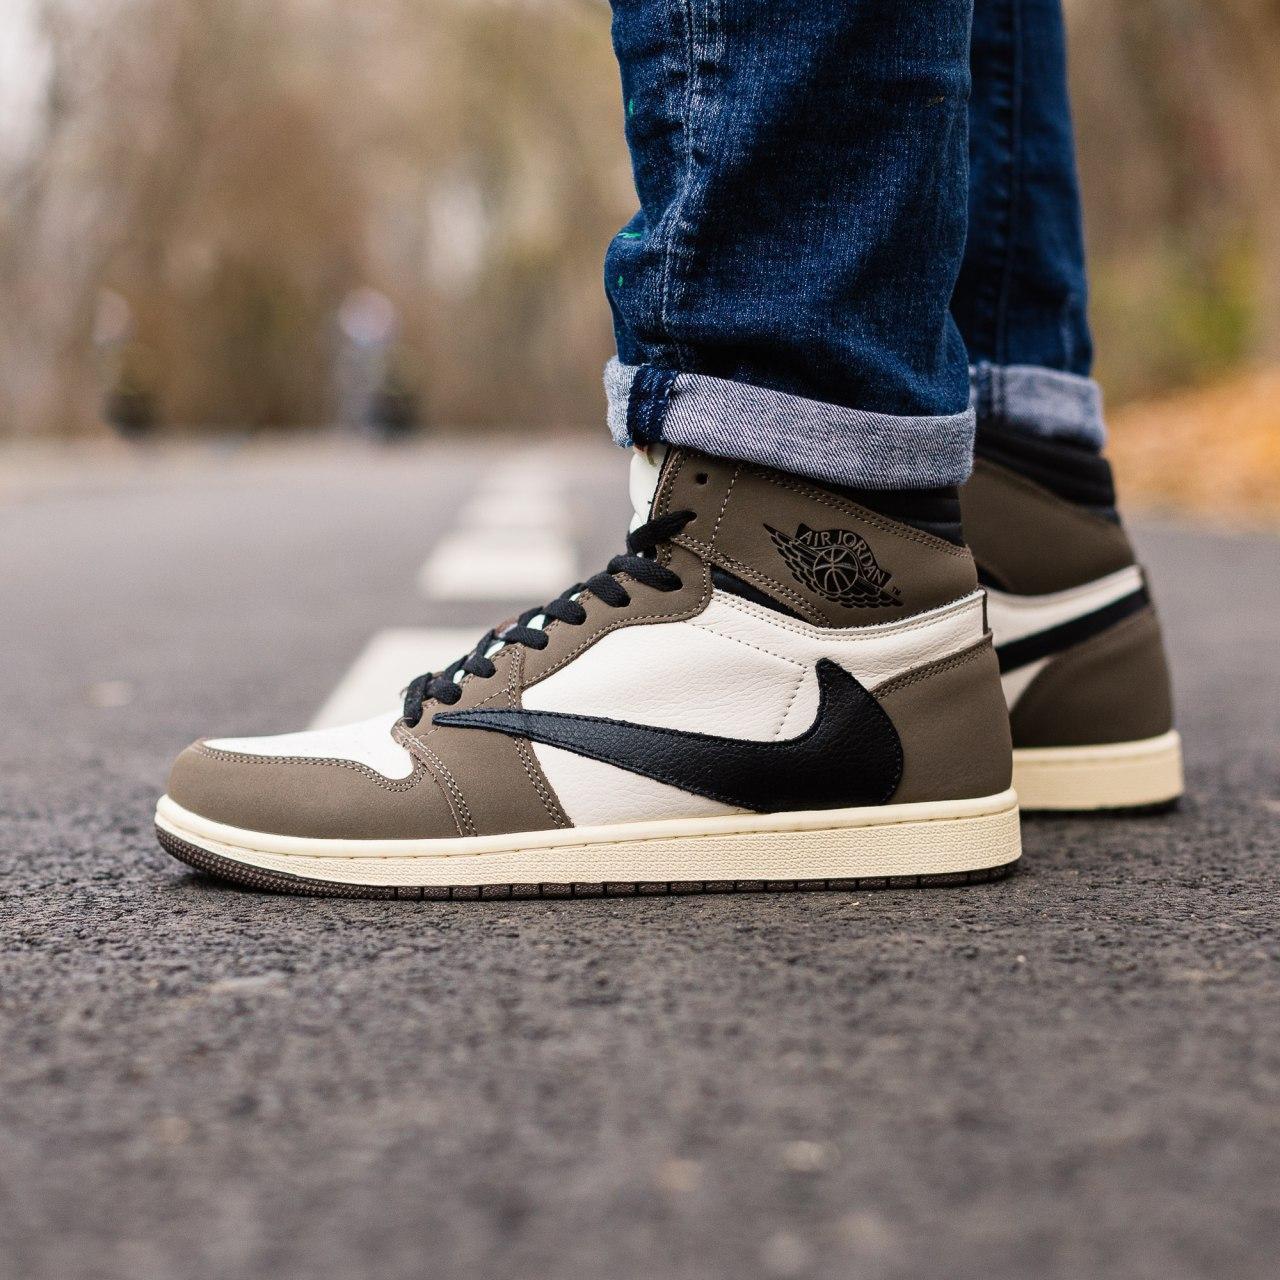 Мужские кроссовки в стиле Nike Air Jordan 1 Retro x Travis Scott (brown/white), Найк Джордан (Реплика ААА)